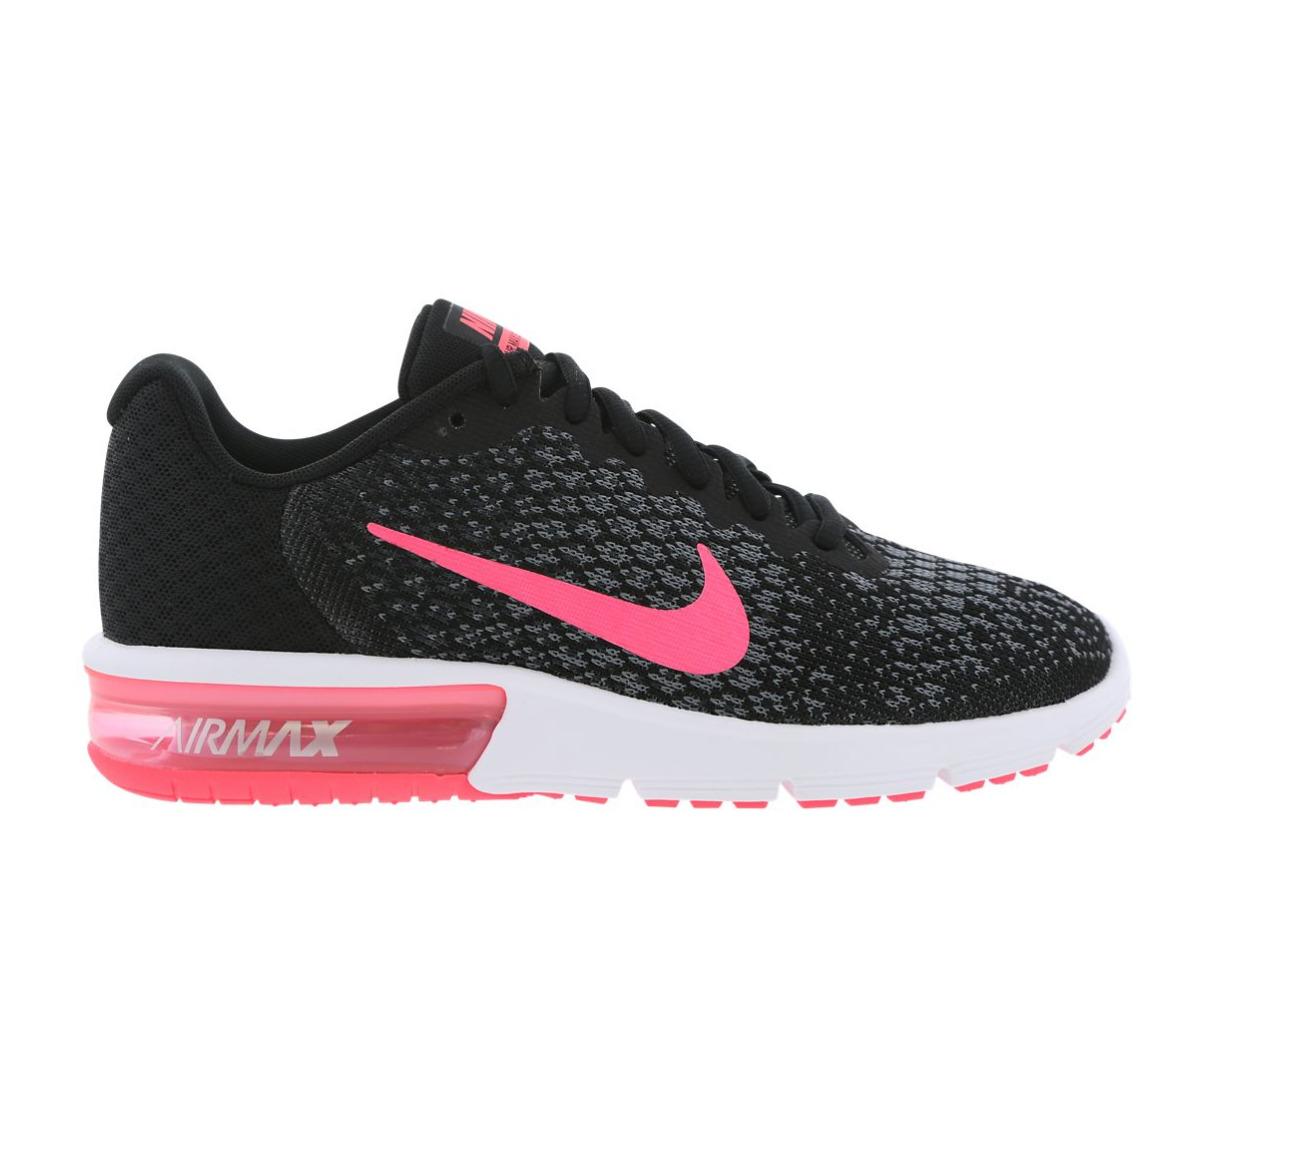 Mujeres Nike Air Max 006 Sequent 2 Negro Zapatillas 852465 006 Max 828cba